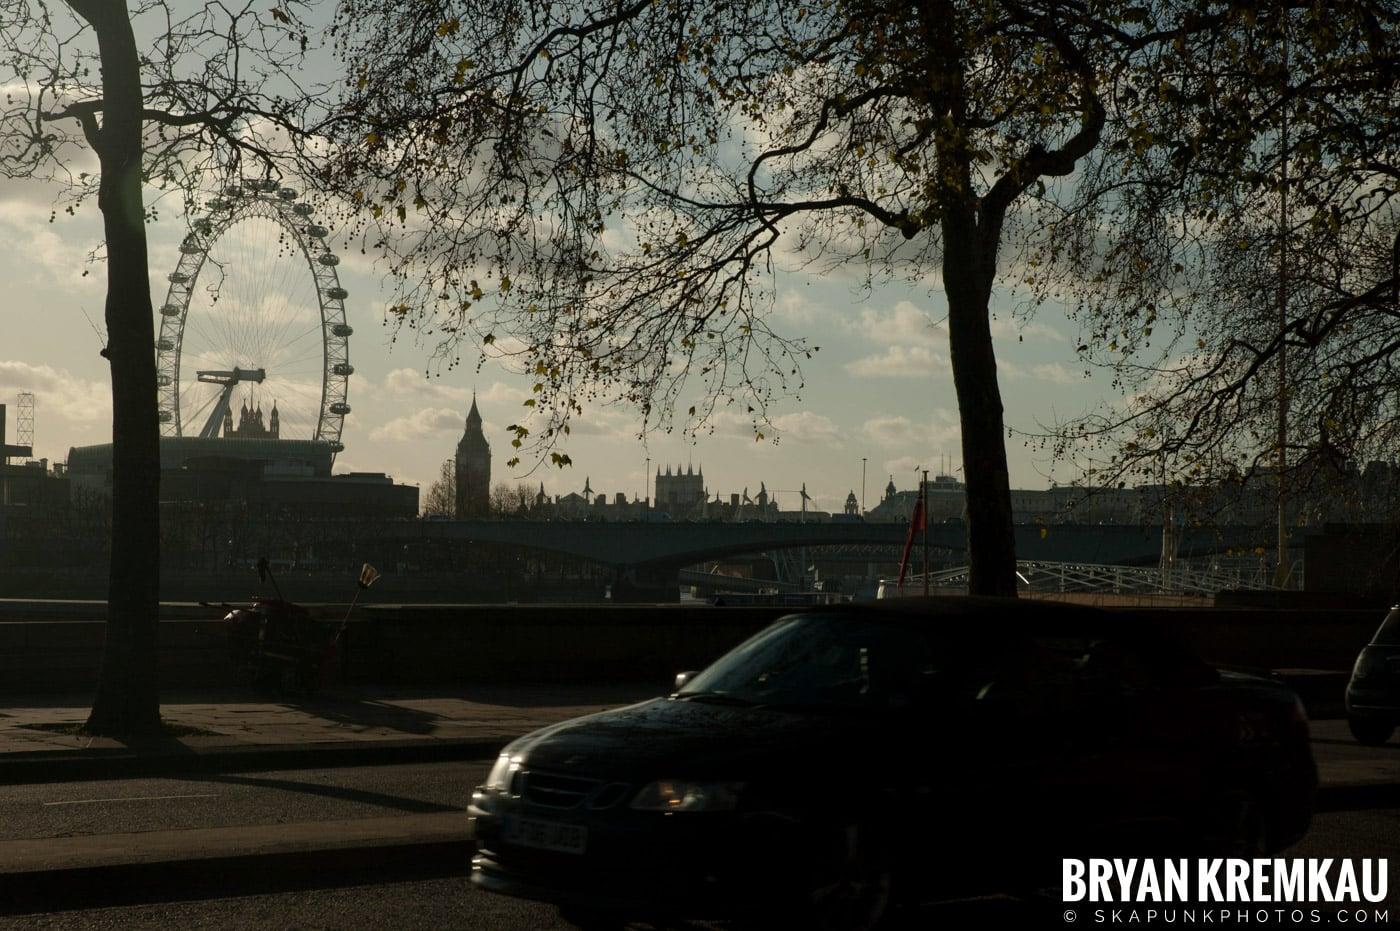 London, England - Day 2 - 12.9.06 (7)